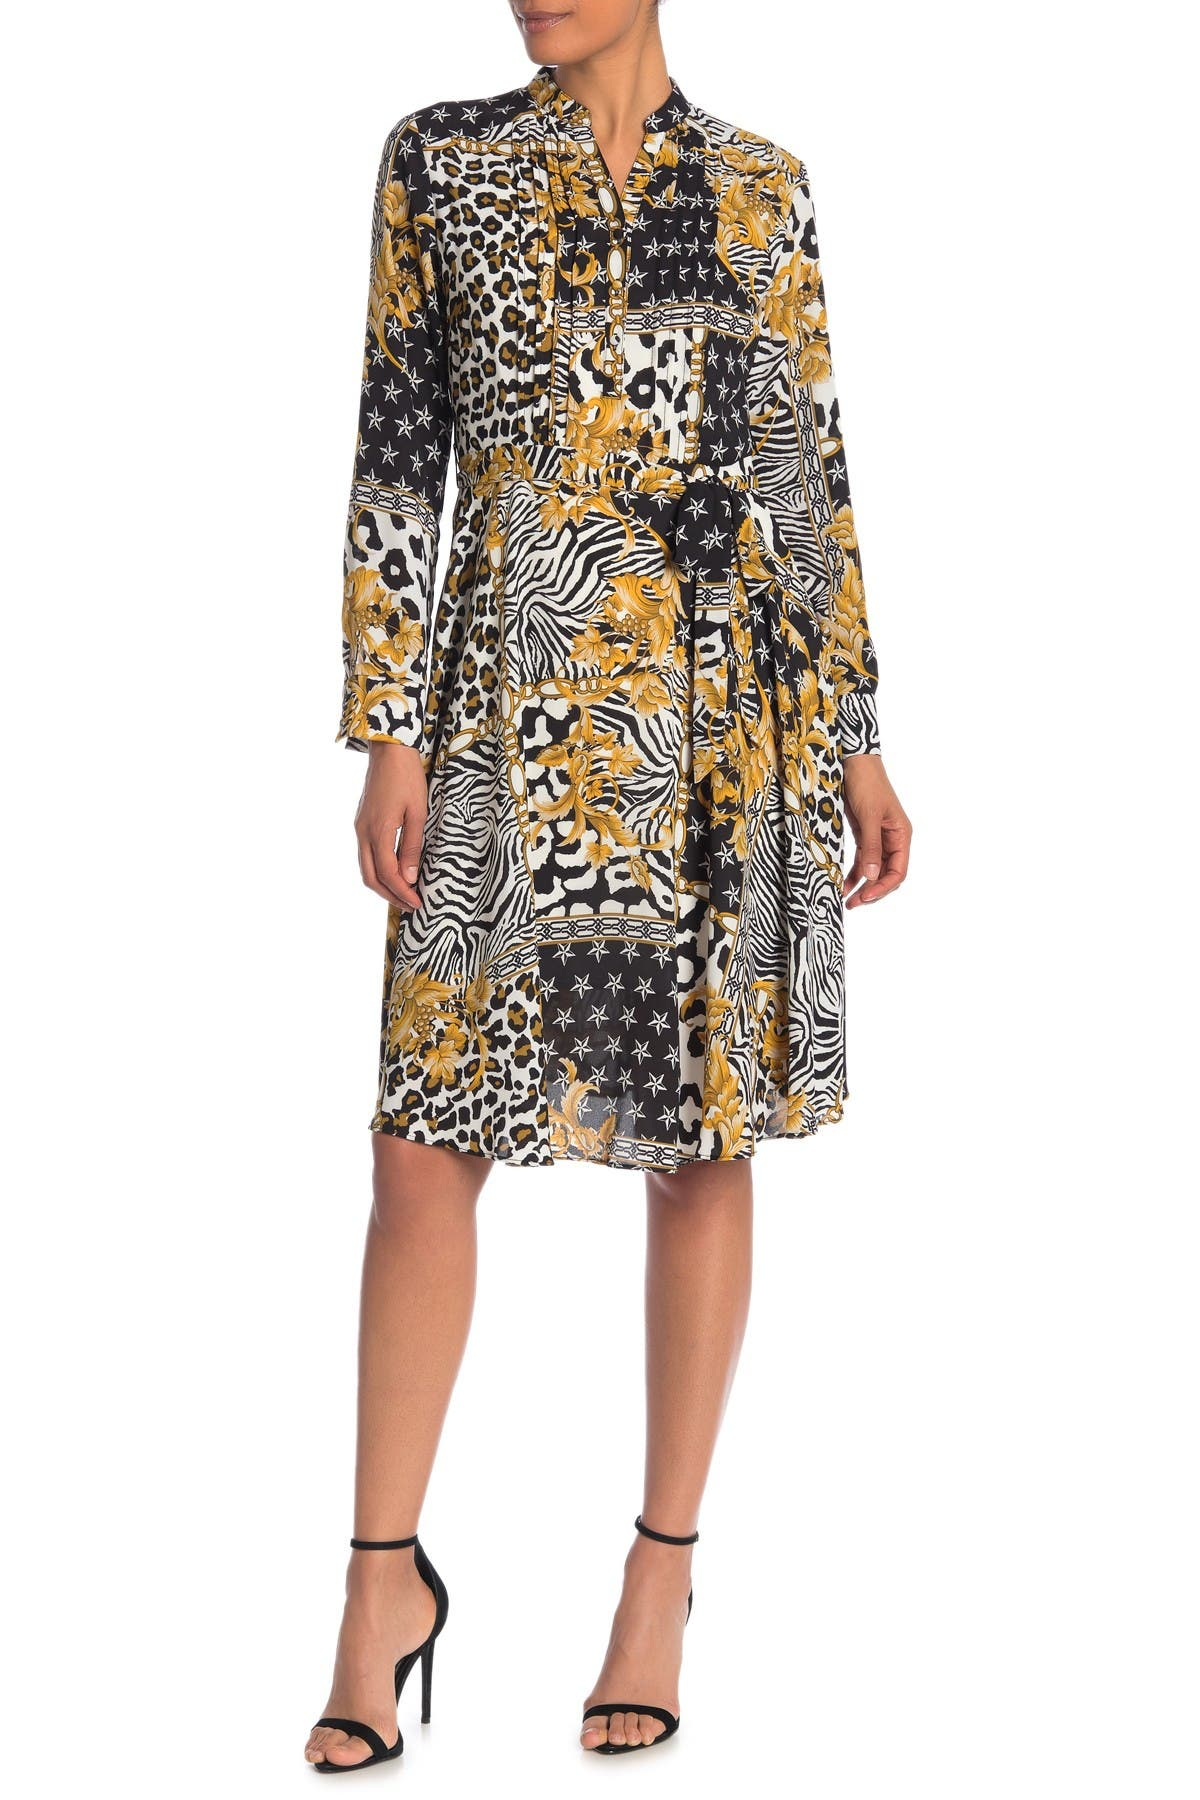 Image of NANETTE nanette lepore Printed Henley Shirt Dress